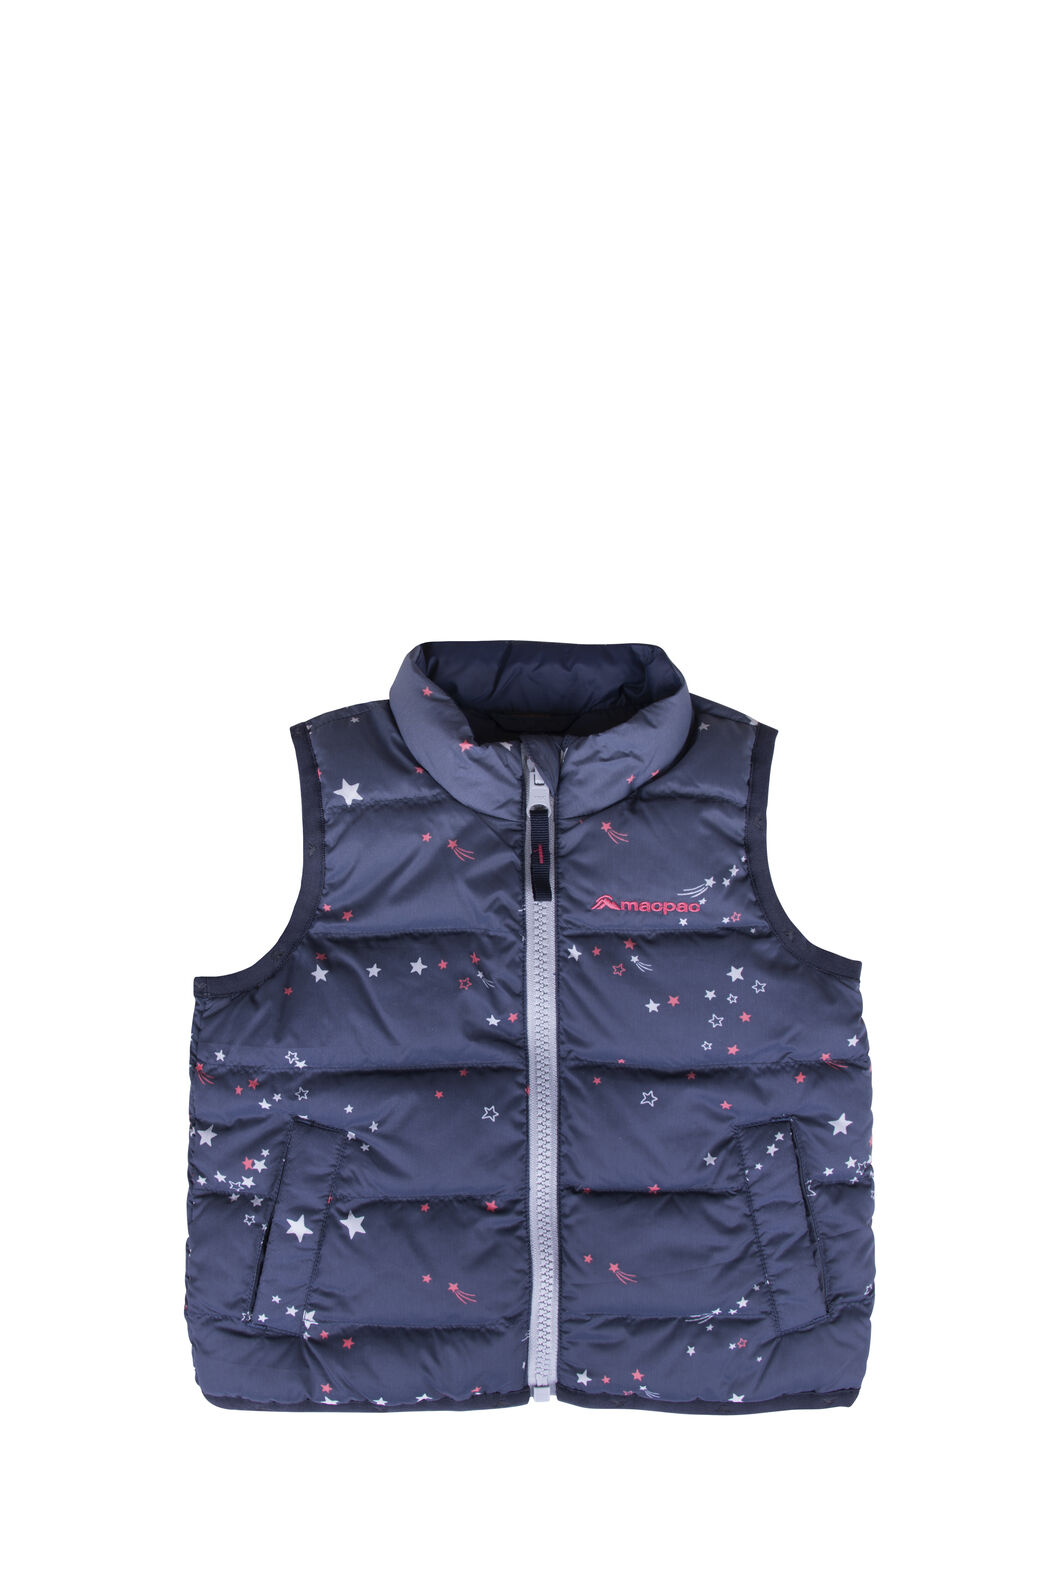 Macpac Atom Down Vest — Baby, Black Iris Print, hi-res